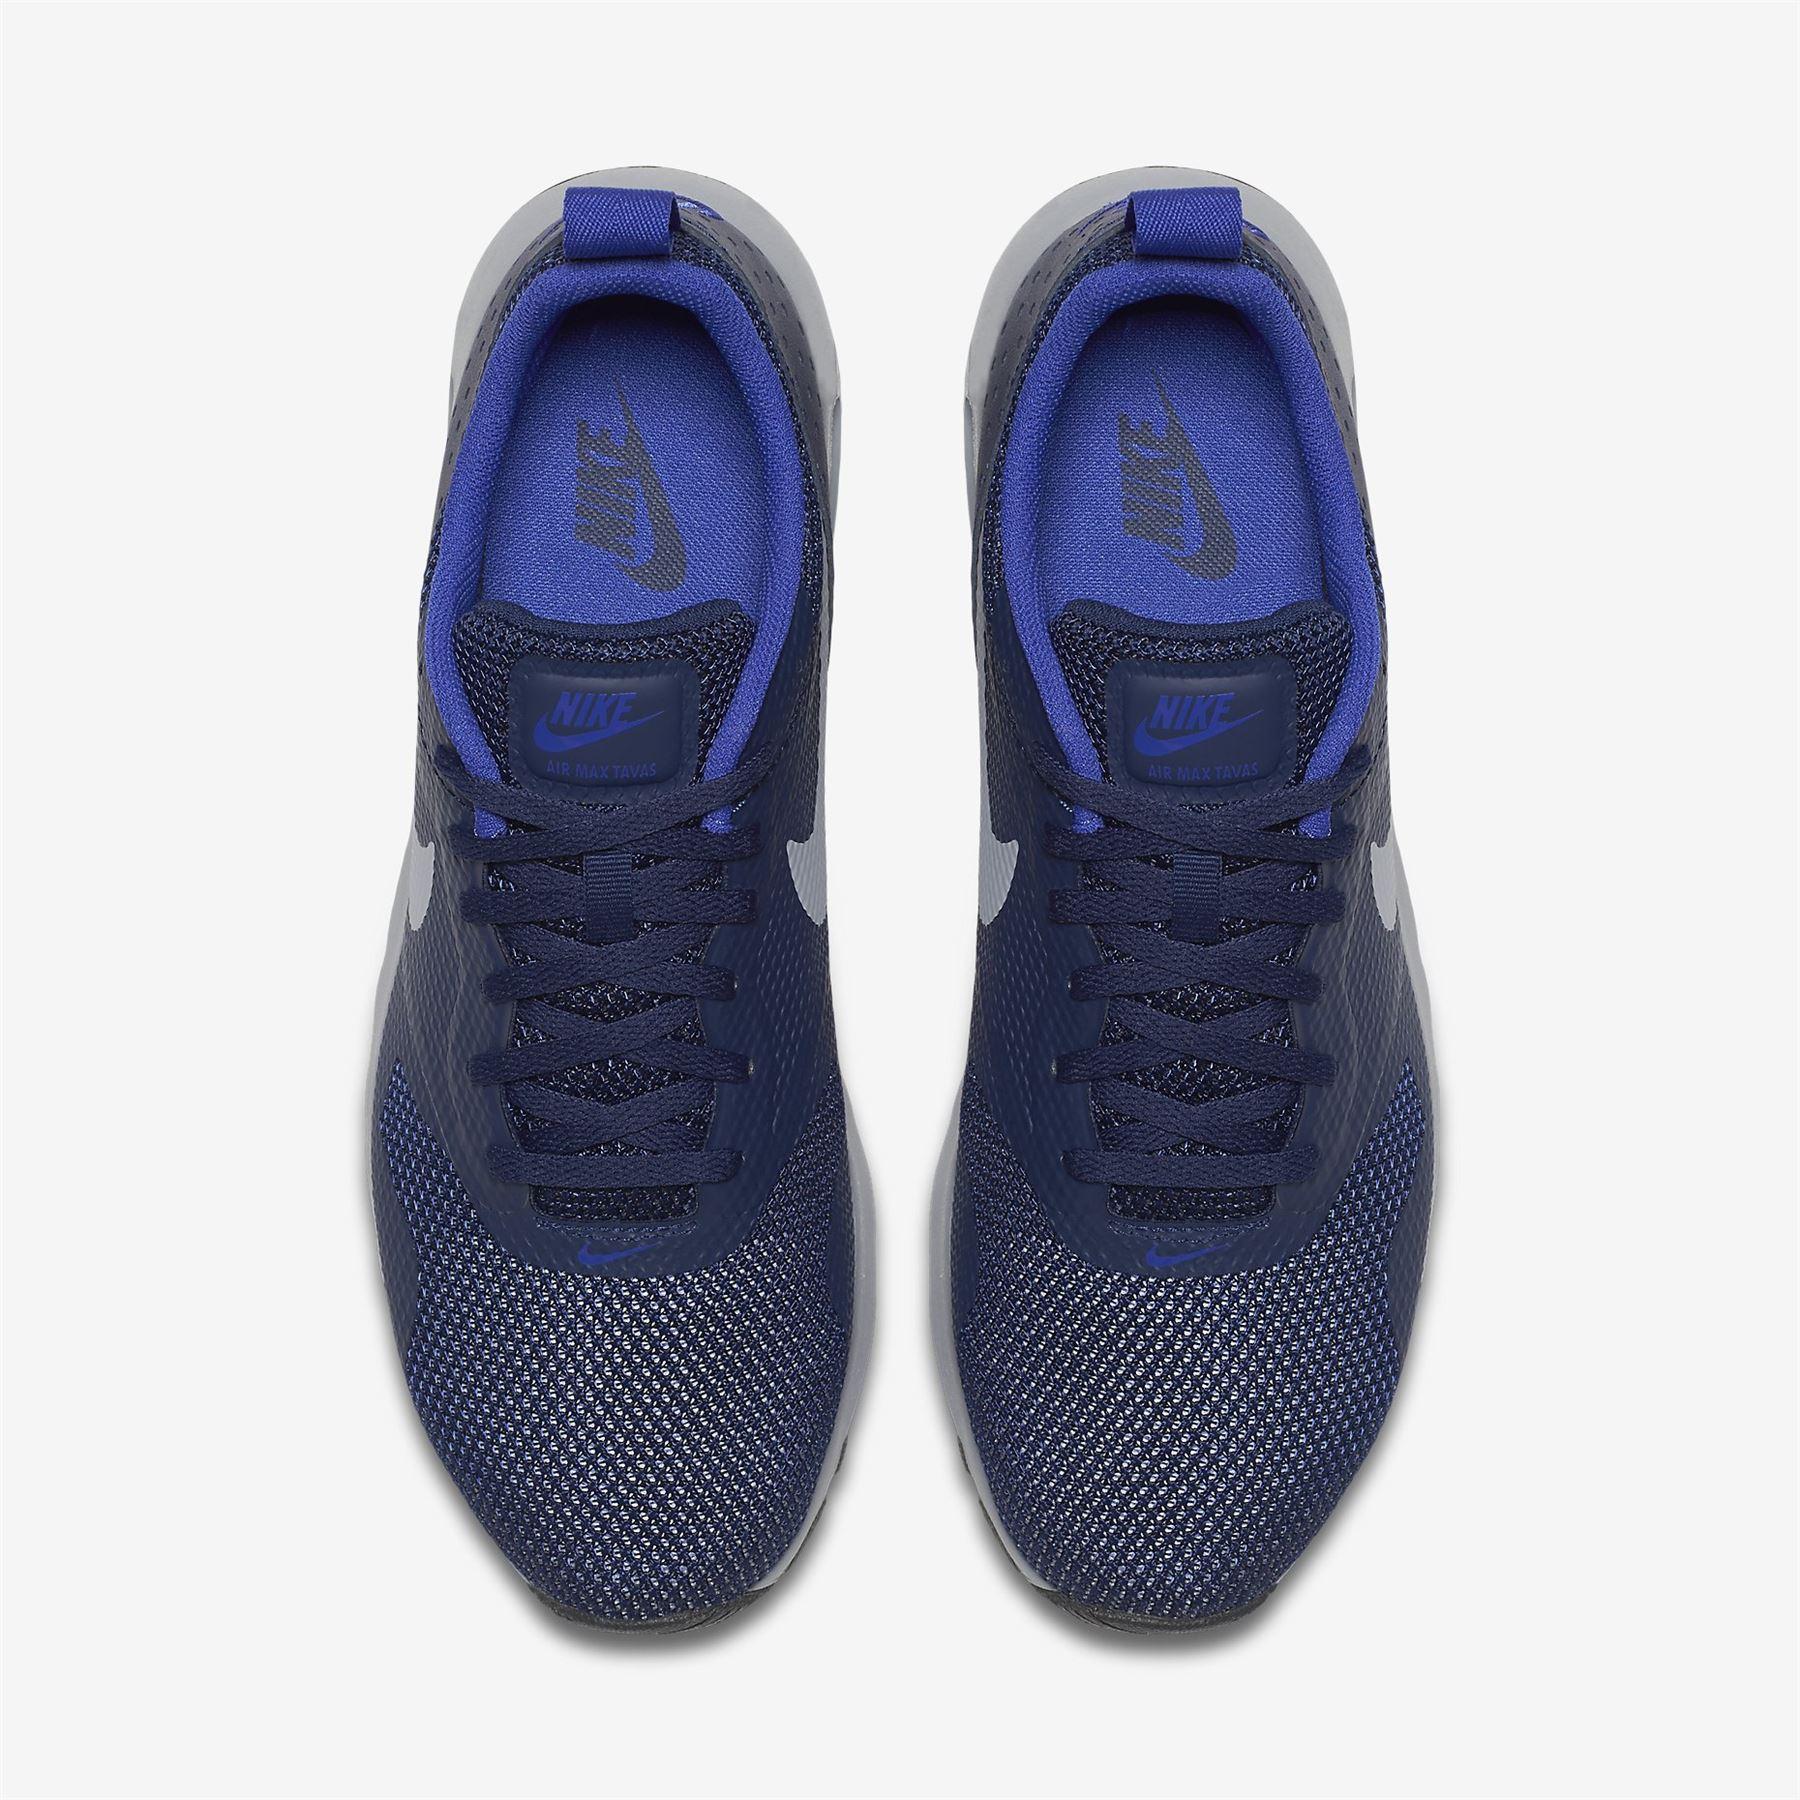 wholesale dealer faadc 63d8f NIKE AIR MAX TAVAS BLUE GREY 705149 408 MEN S UK 6-11